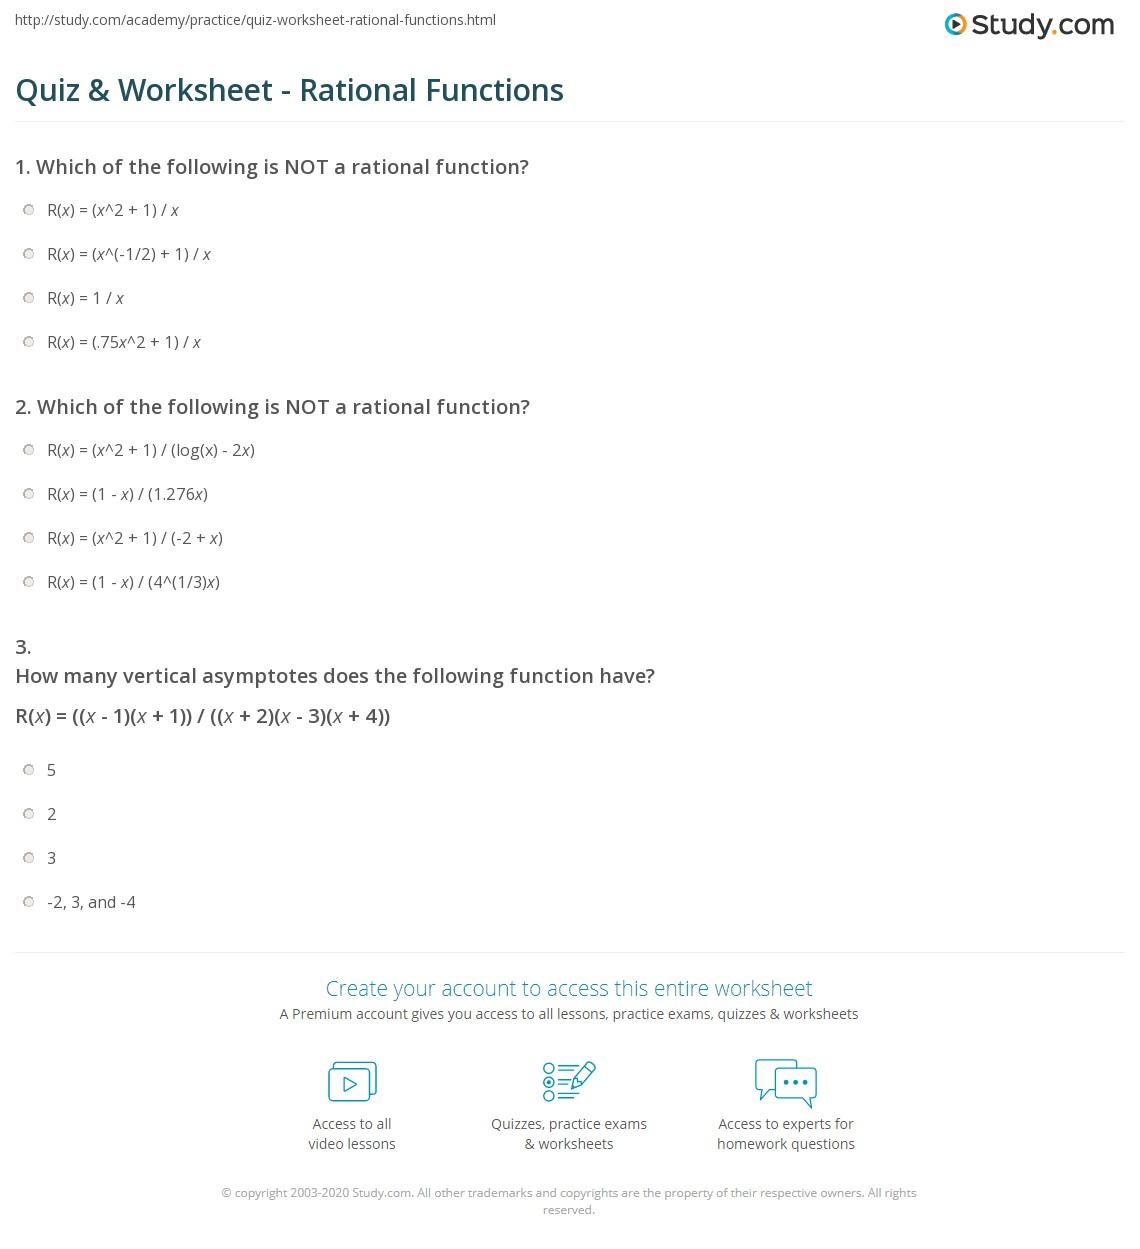 Quiz & Worksheet - Rational Functions | Study.com